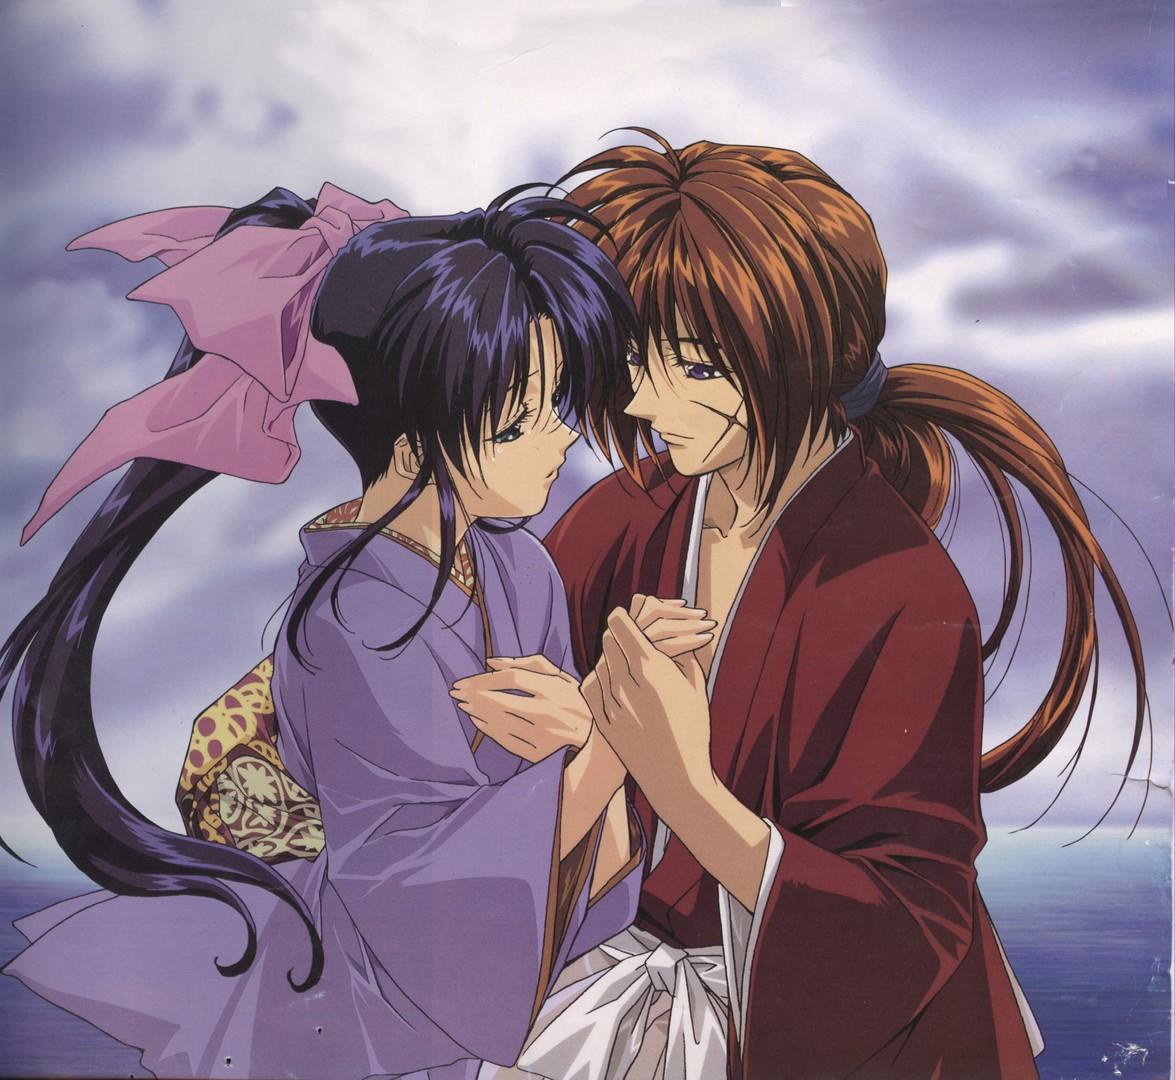 Descargar Rurouni Kenshin: Meiji Kenkaku Romantan DVDbox